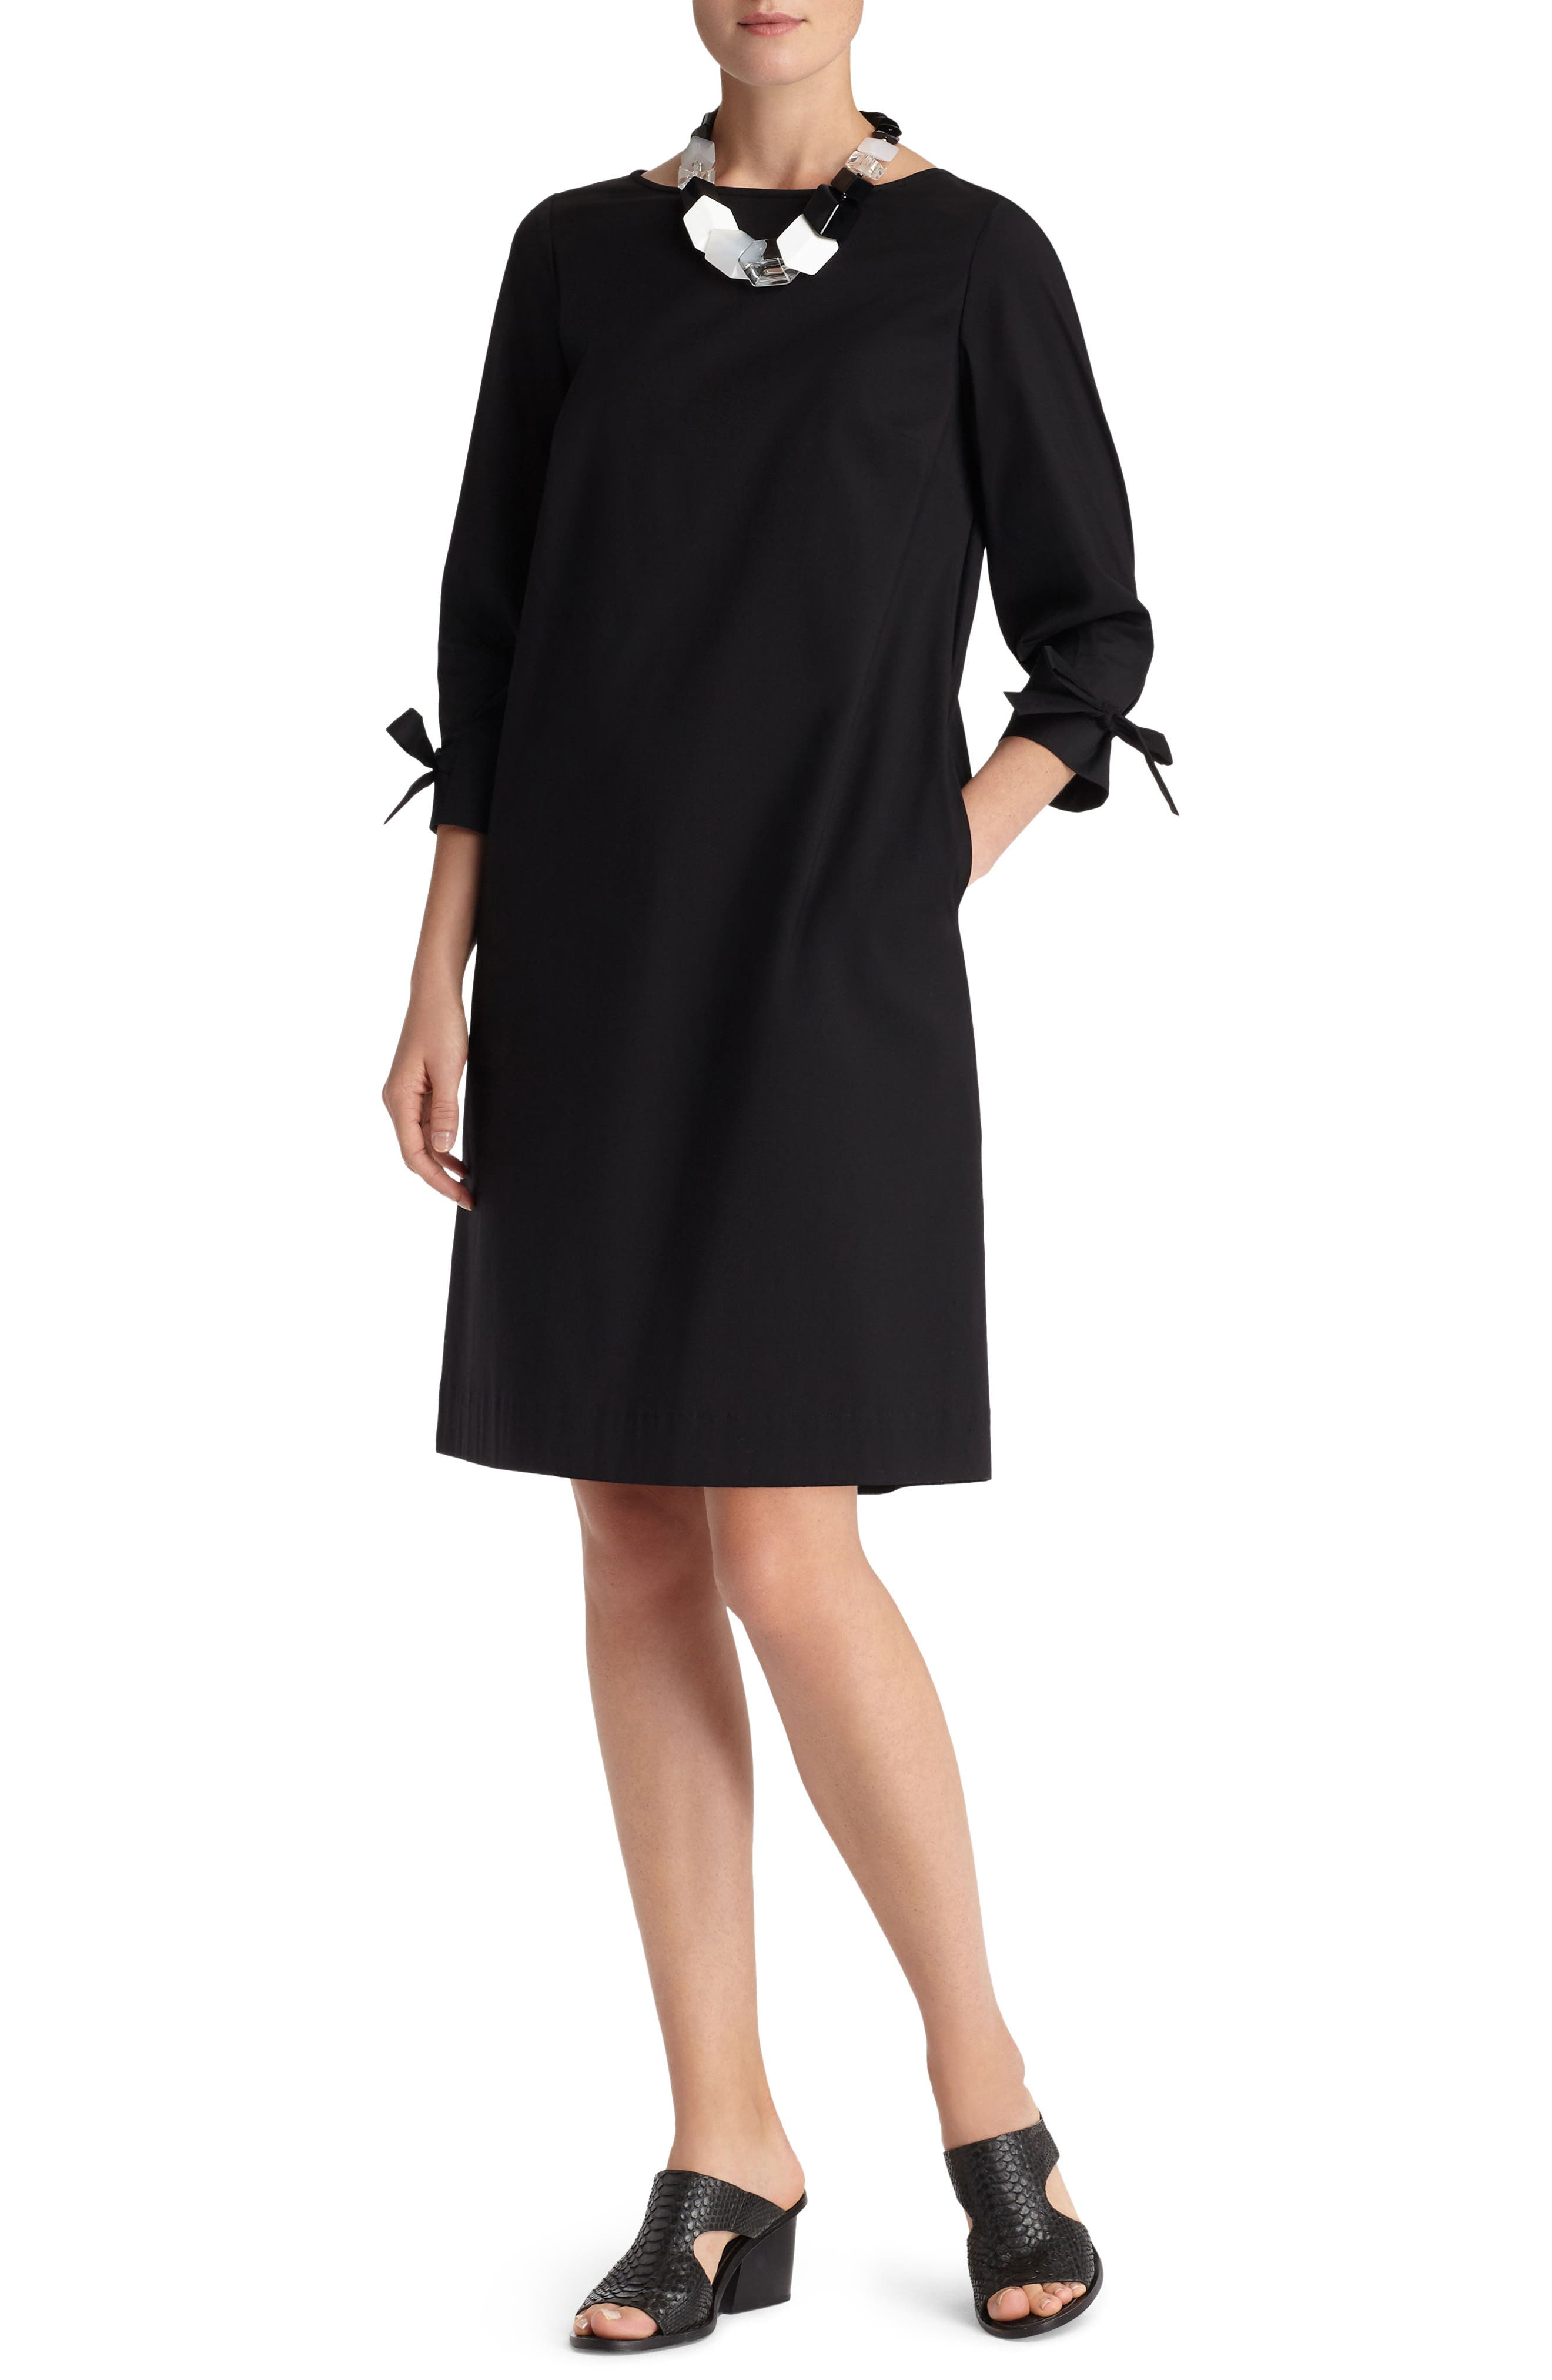 Lafayette 148 New York Paige Cotton Blend Dress